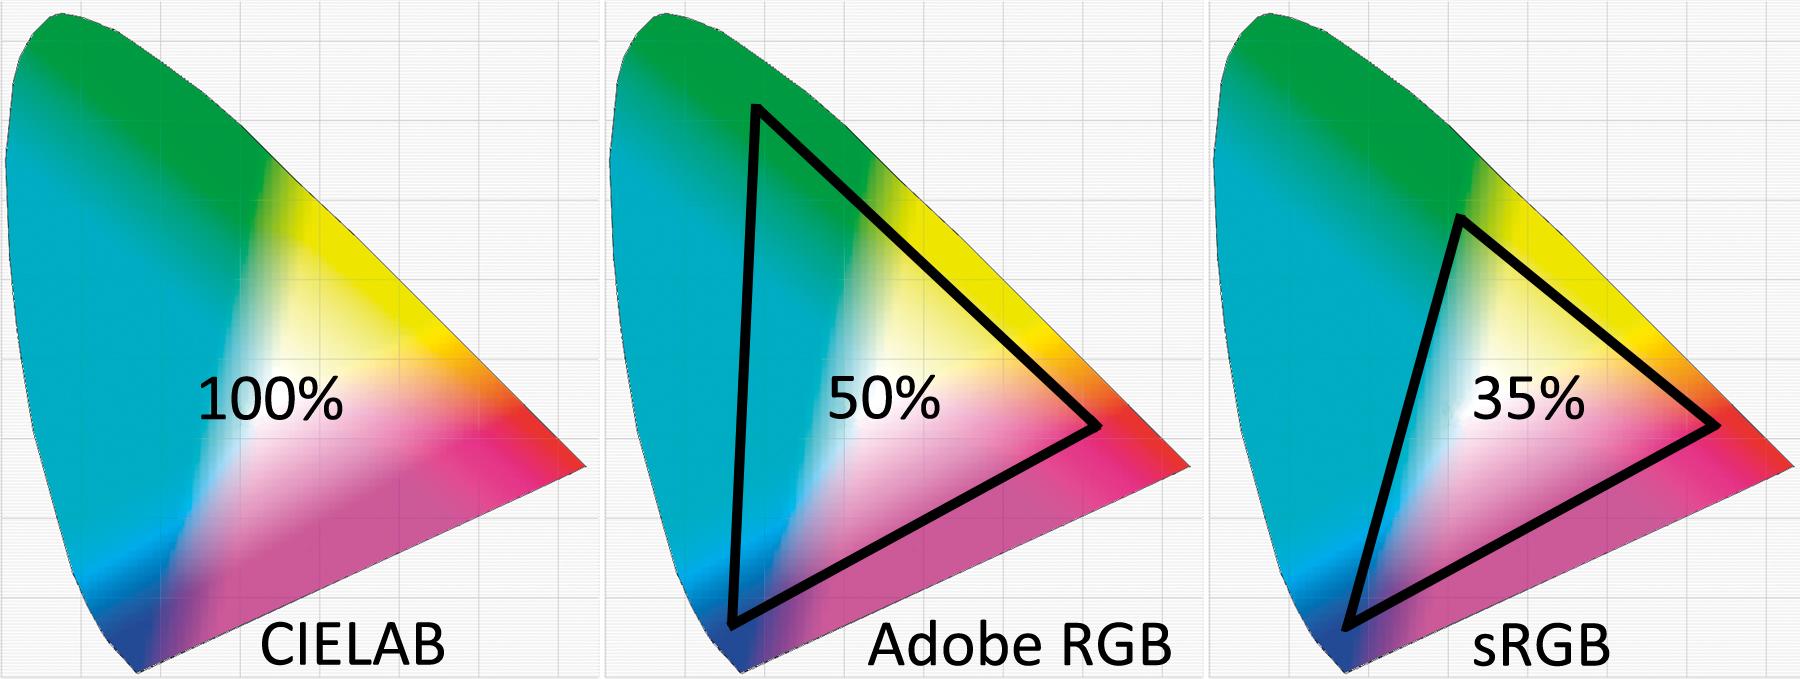 مفاهیم پایه مدیریت رنگ - color space